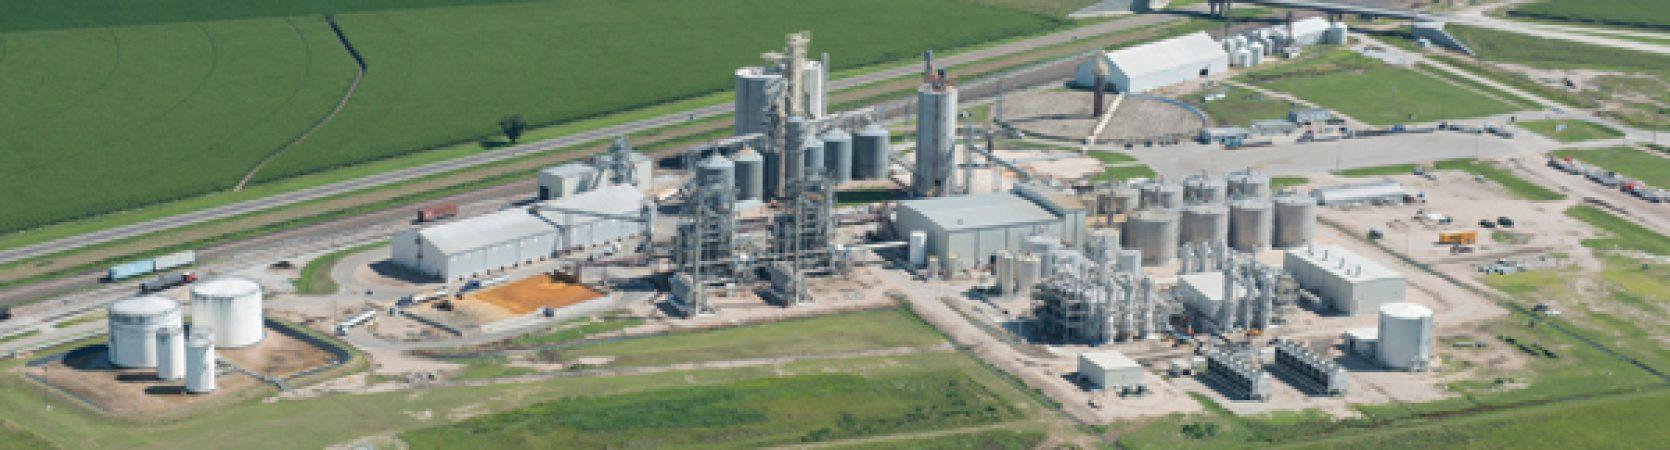 Green Plains Renewable Energy Wood River NE ethanol plant EAD structural engineering